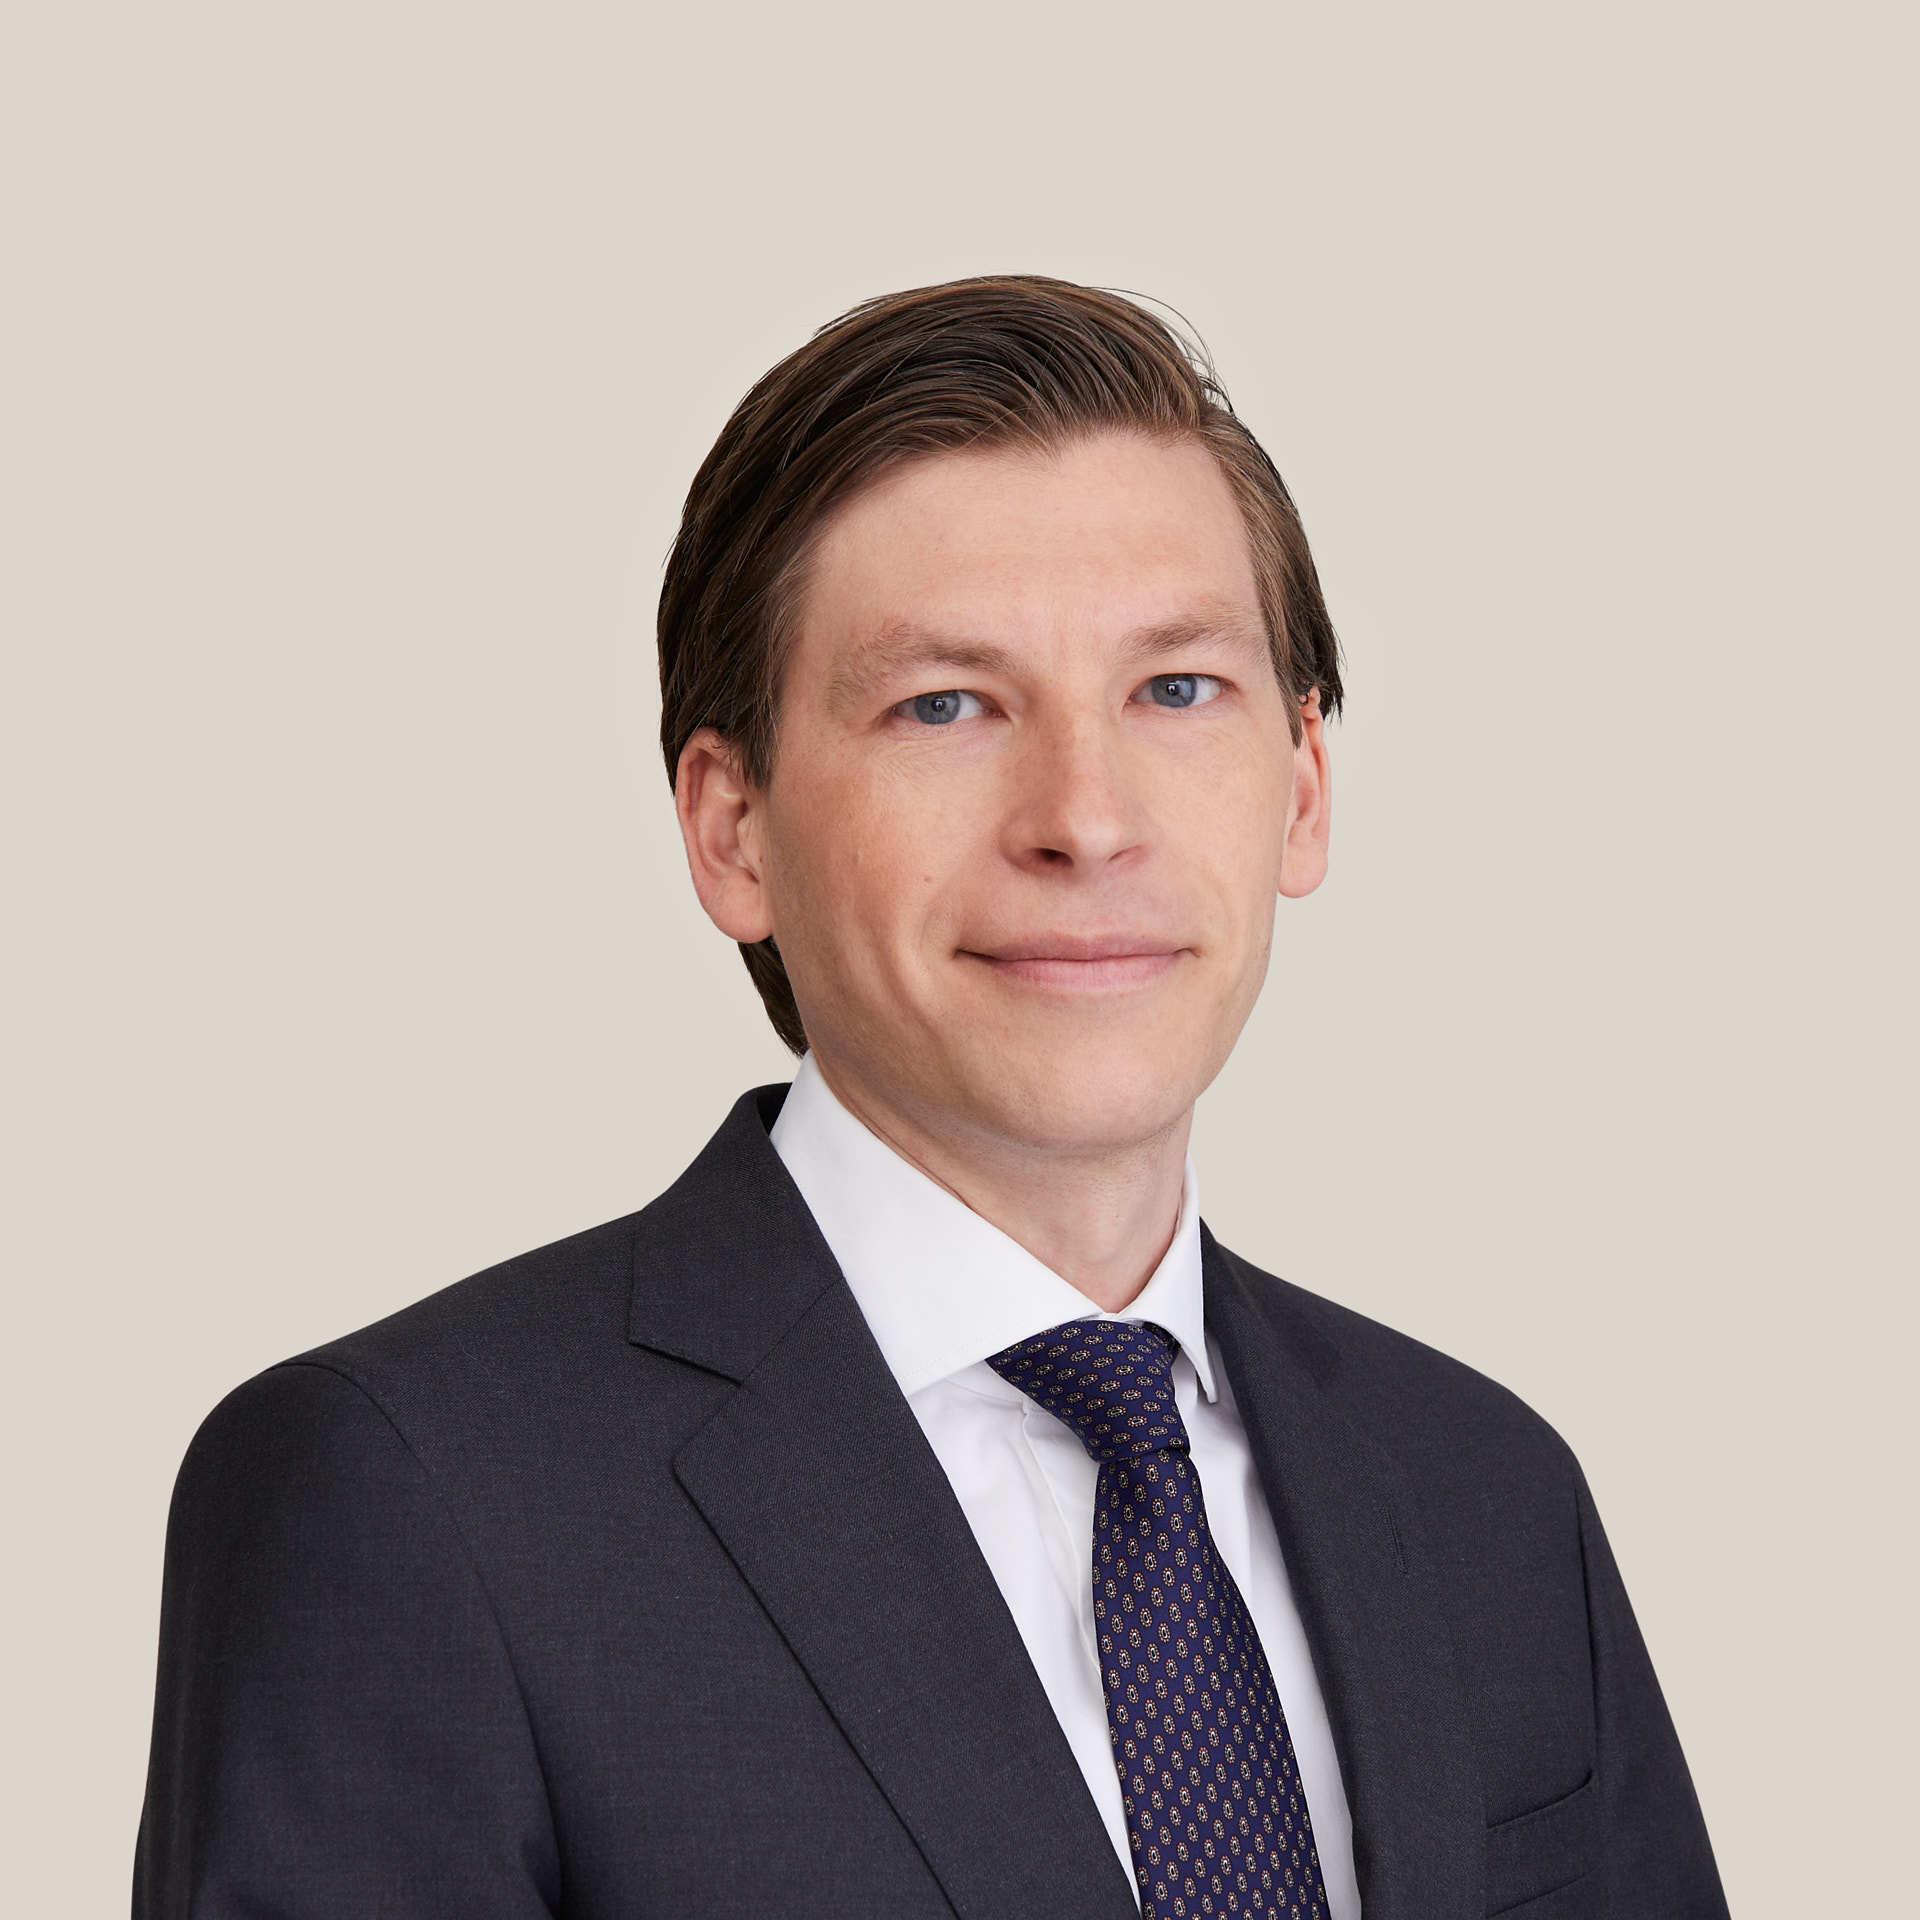 Arne munch